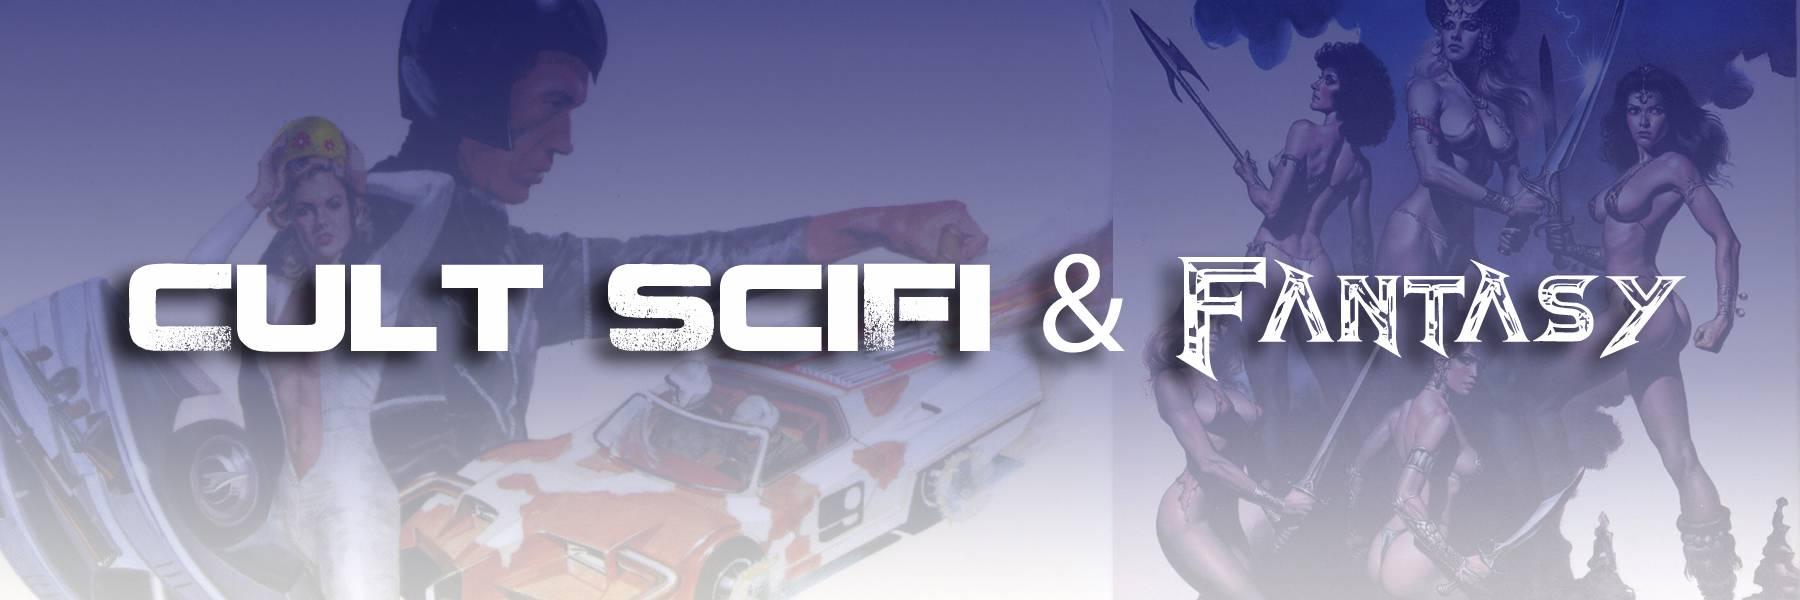 Cult Sci Fi & Fantasy